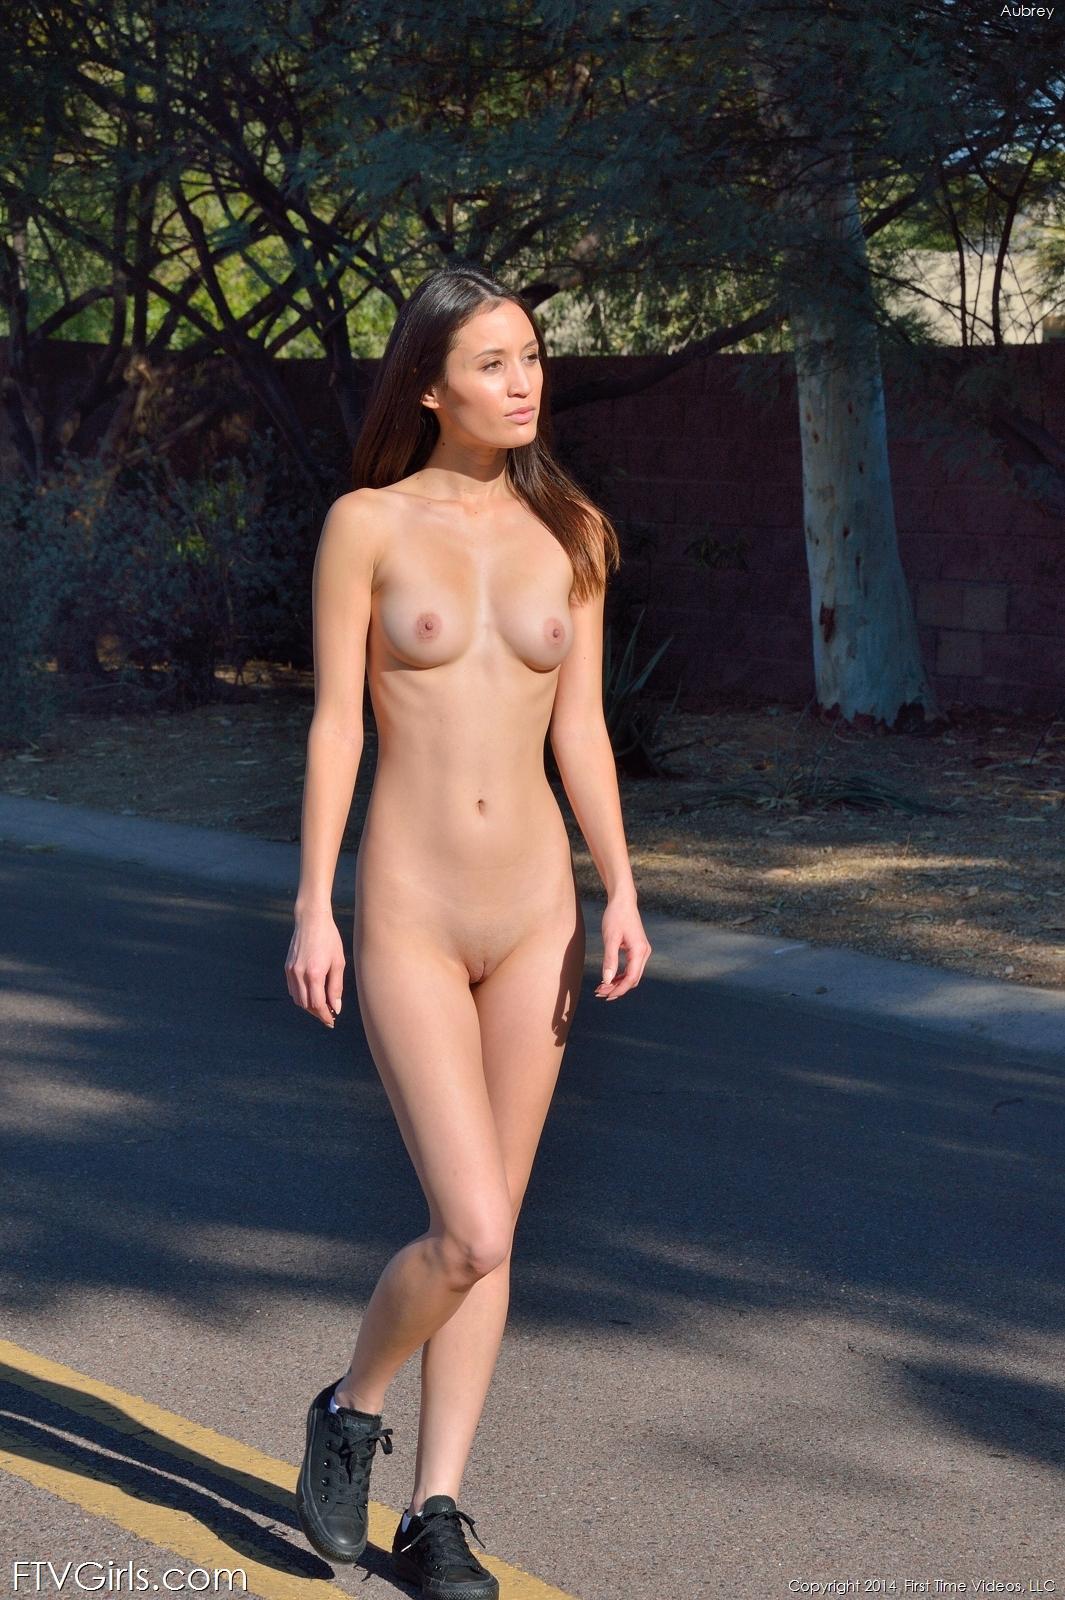 aubrey-shorts-nude-public-road-ftvgirls-18